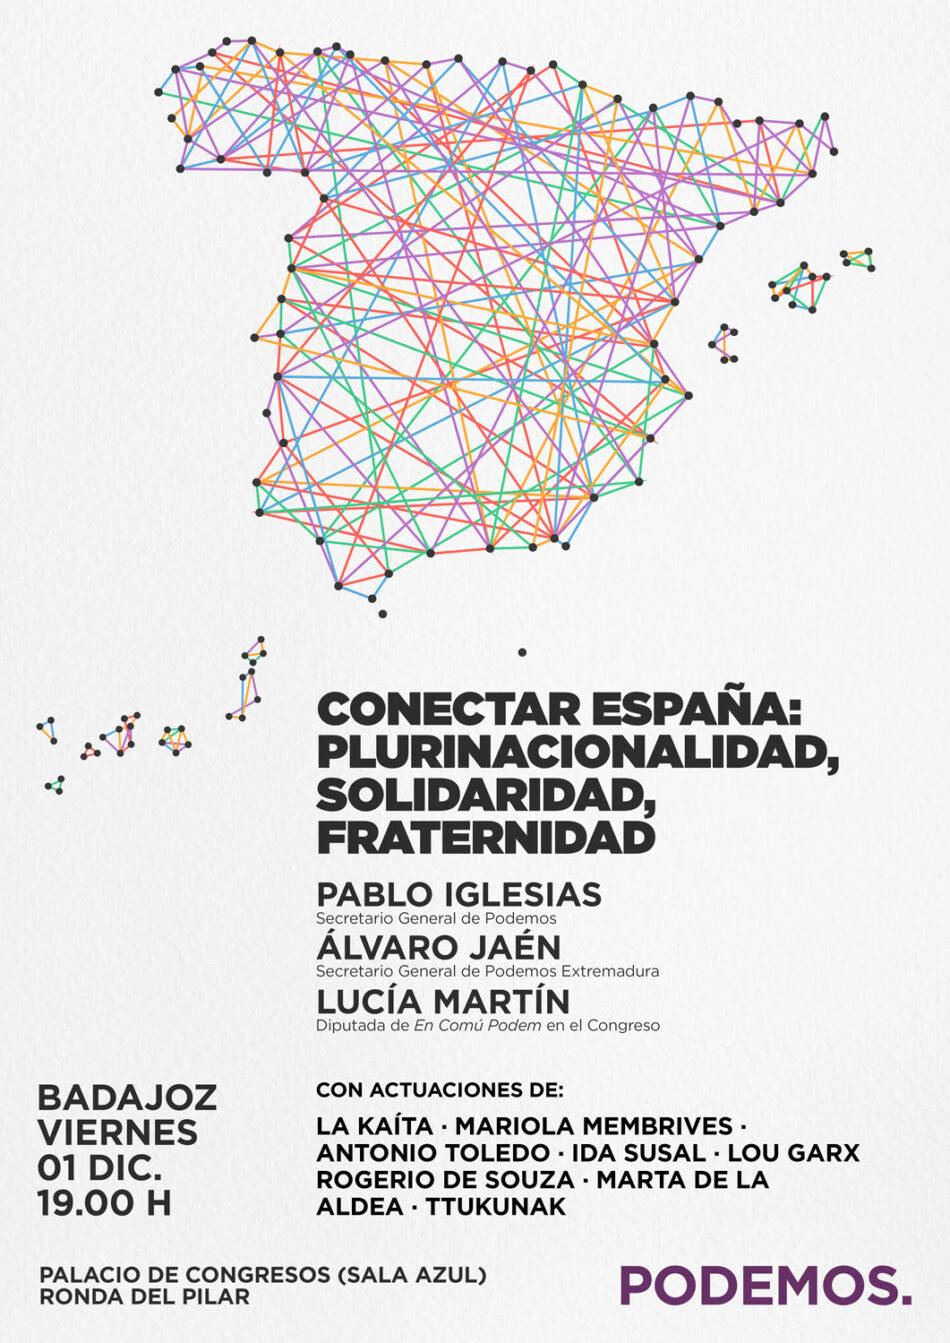 Pablo Iglesias visita Badajoz dentro de la ruta «Conectar España»